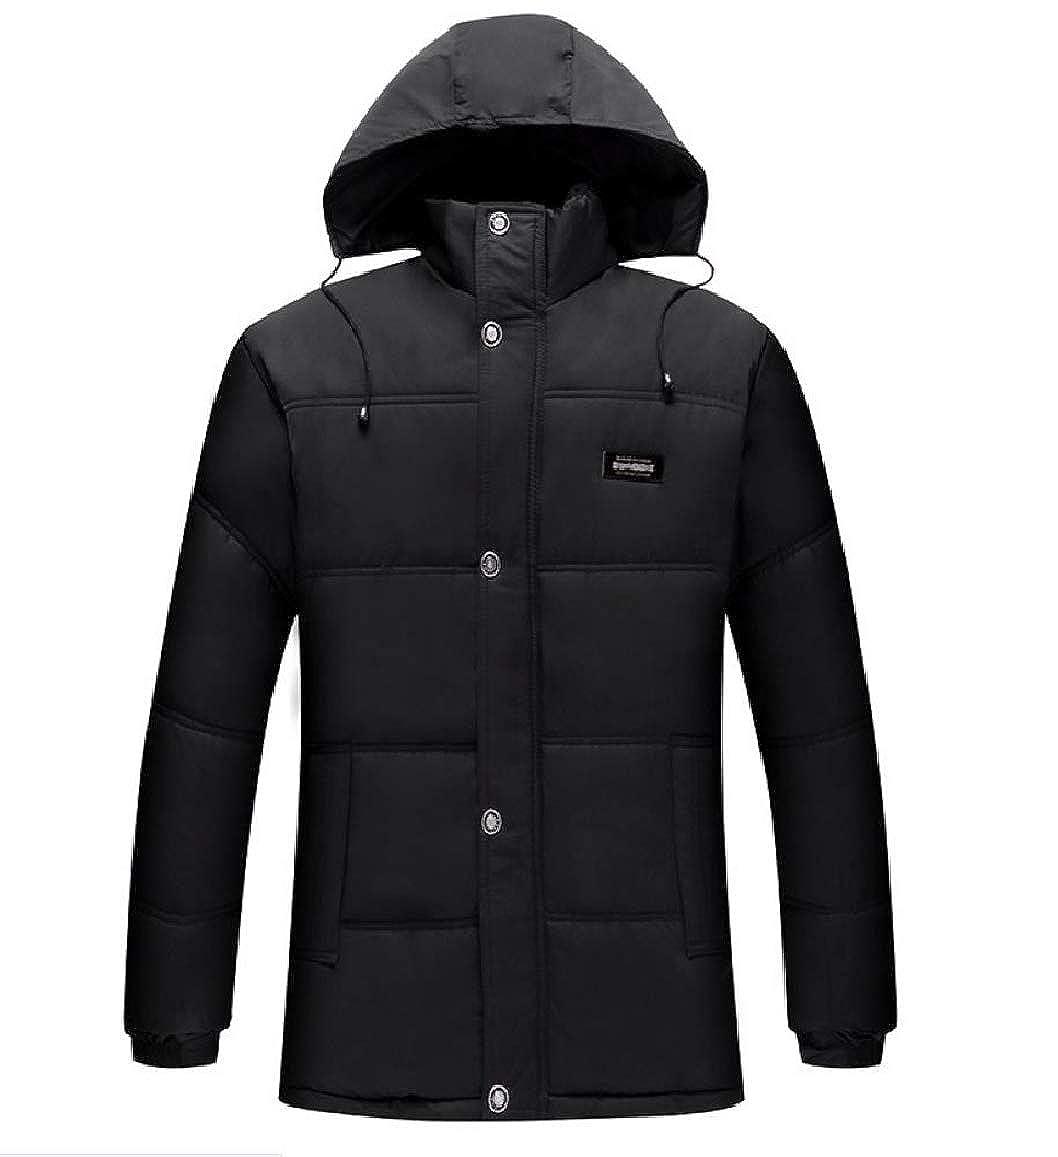 RDHOPE-Men Quilted Hooded Plus Size Fleece Outwear Coat Simple Anorak Jacket